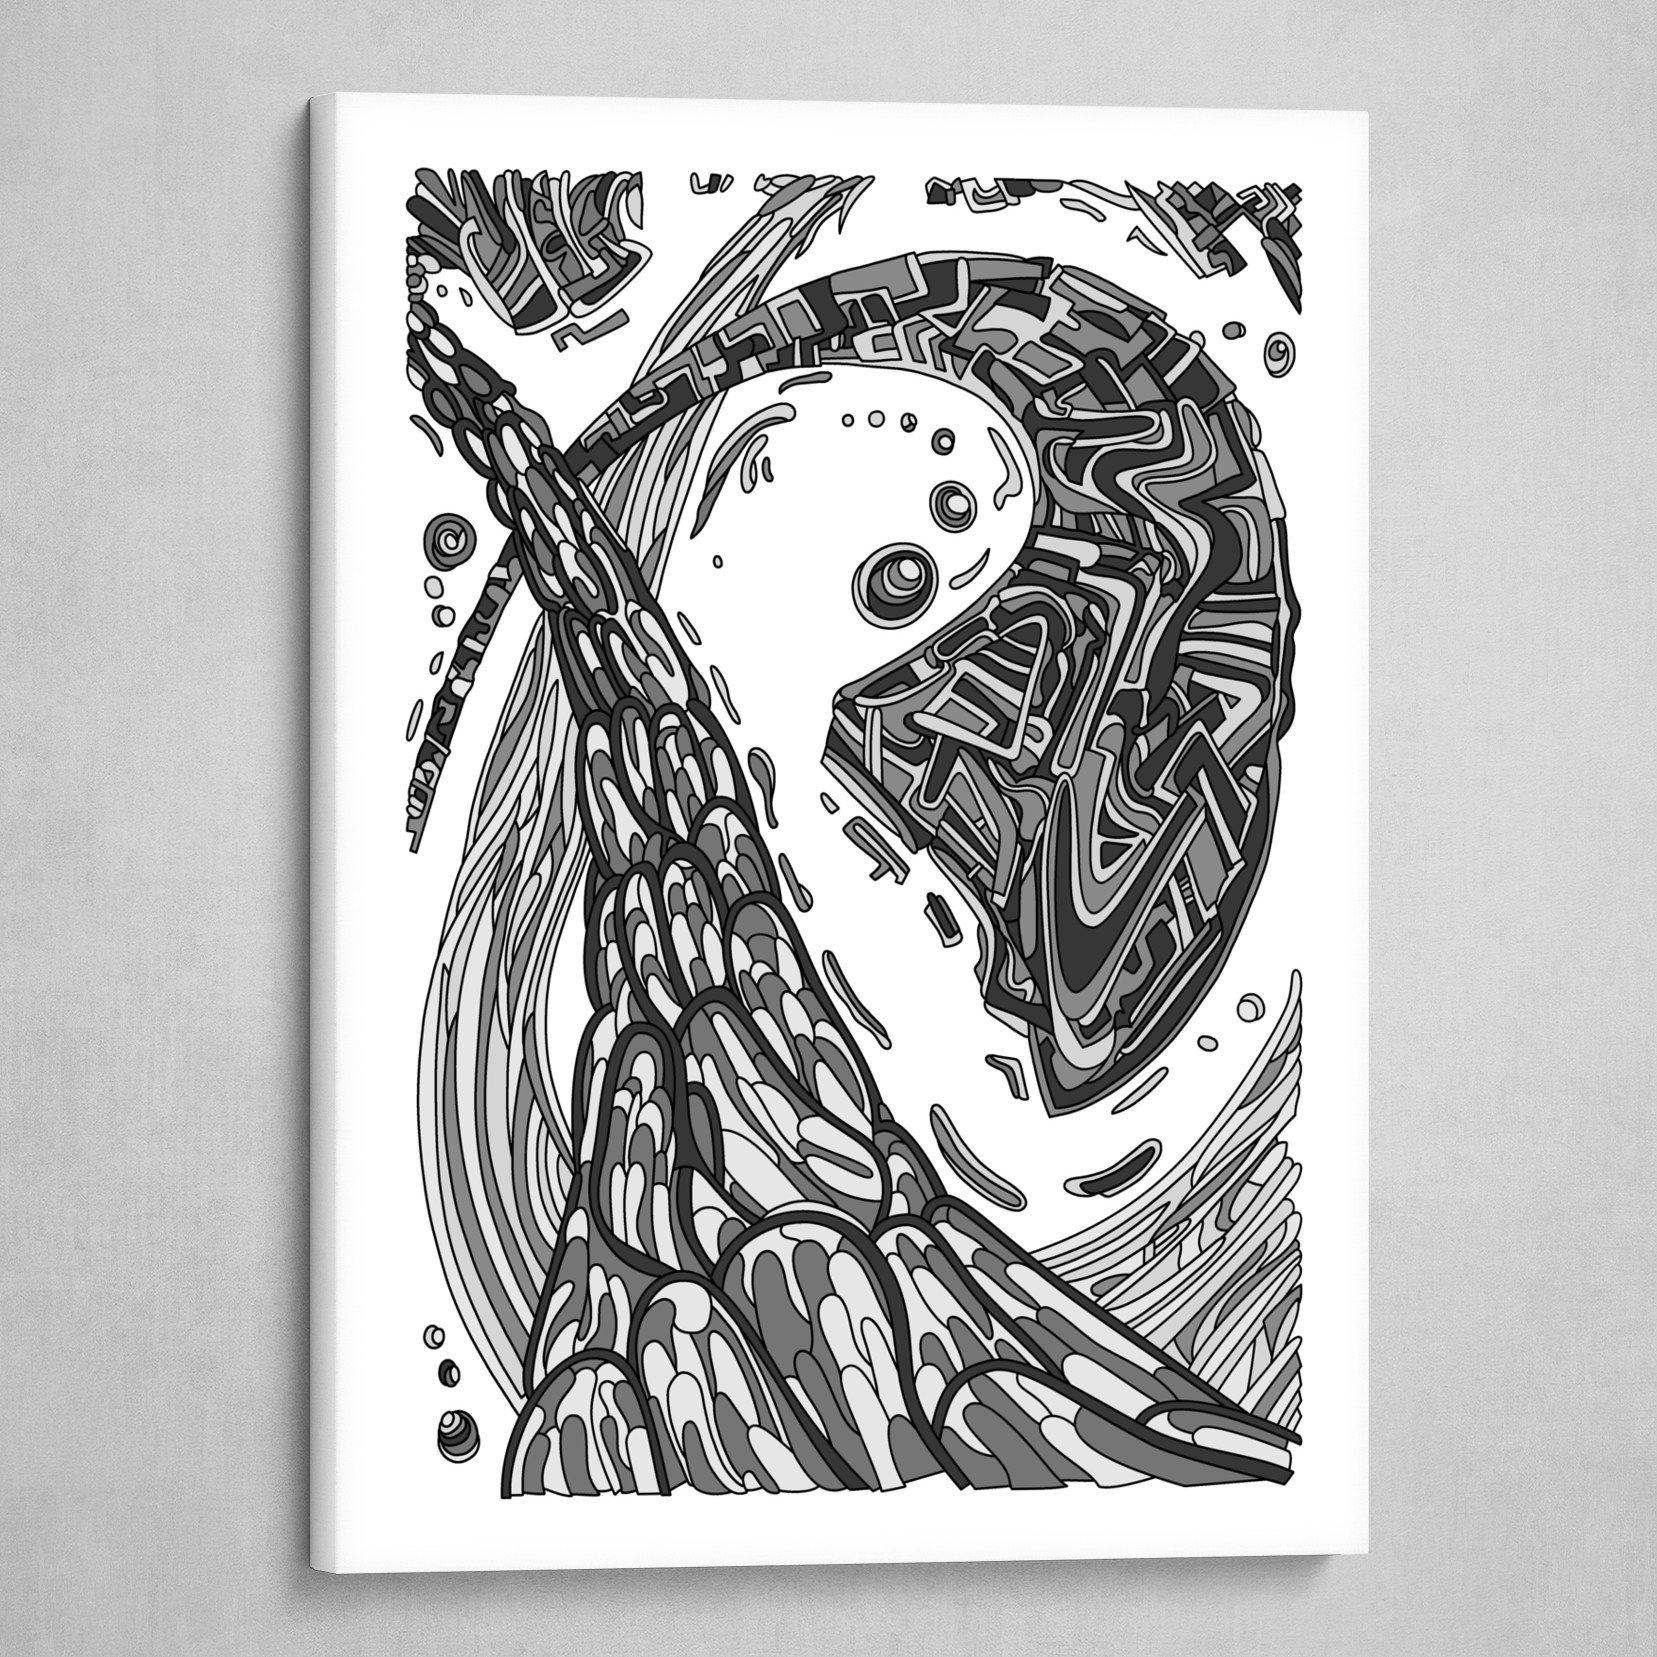 Wandering 35: grayscale